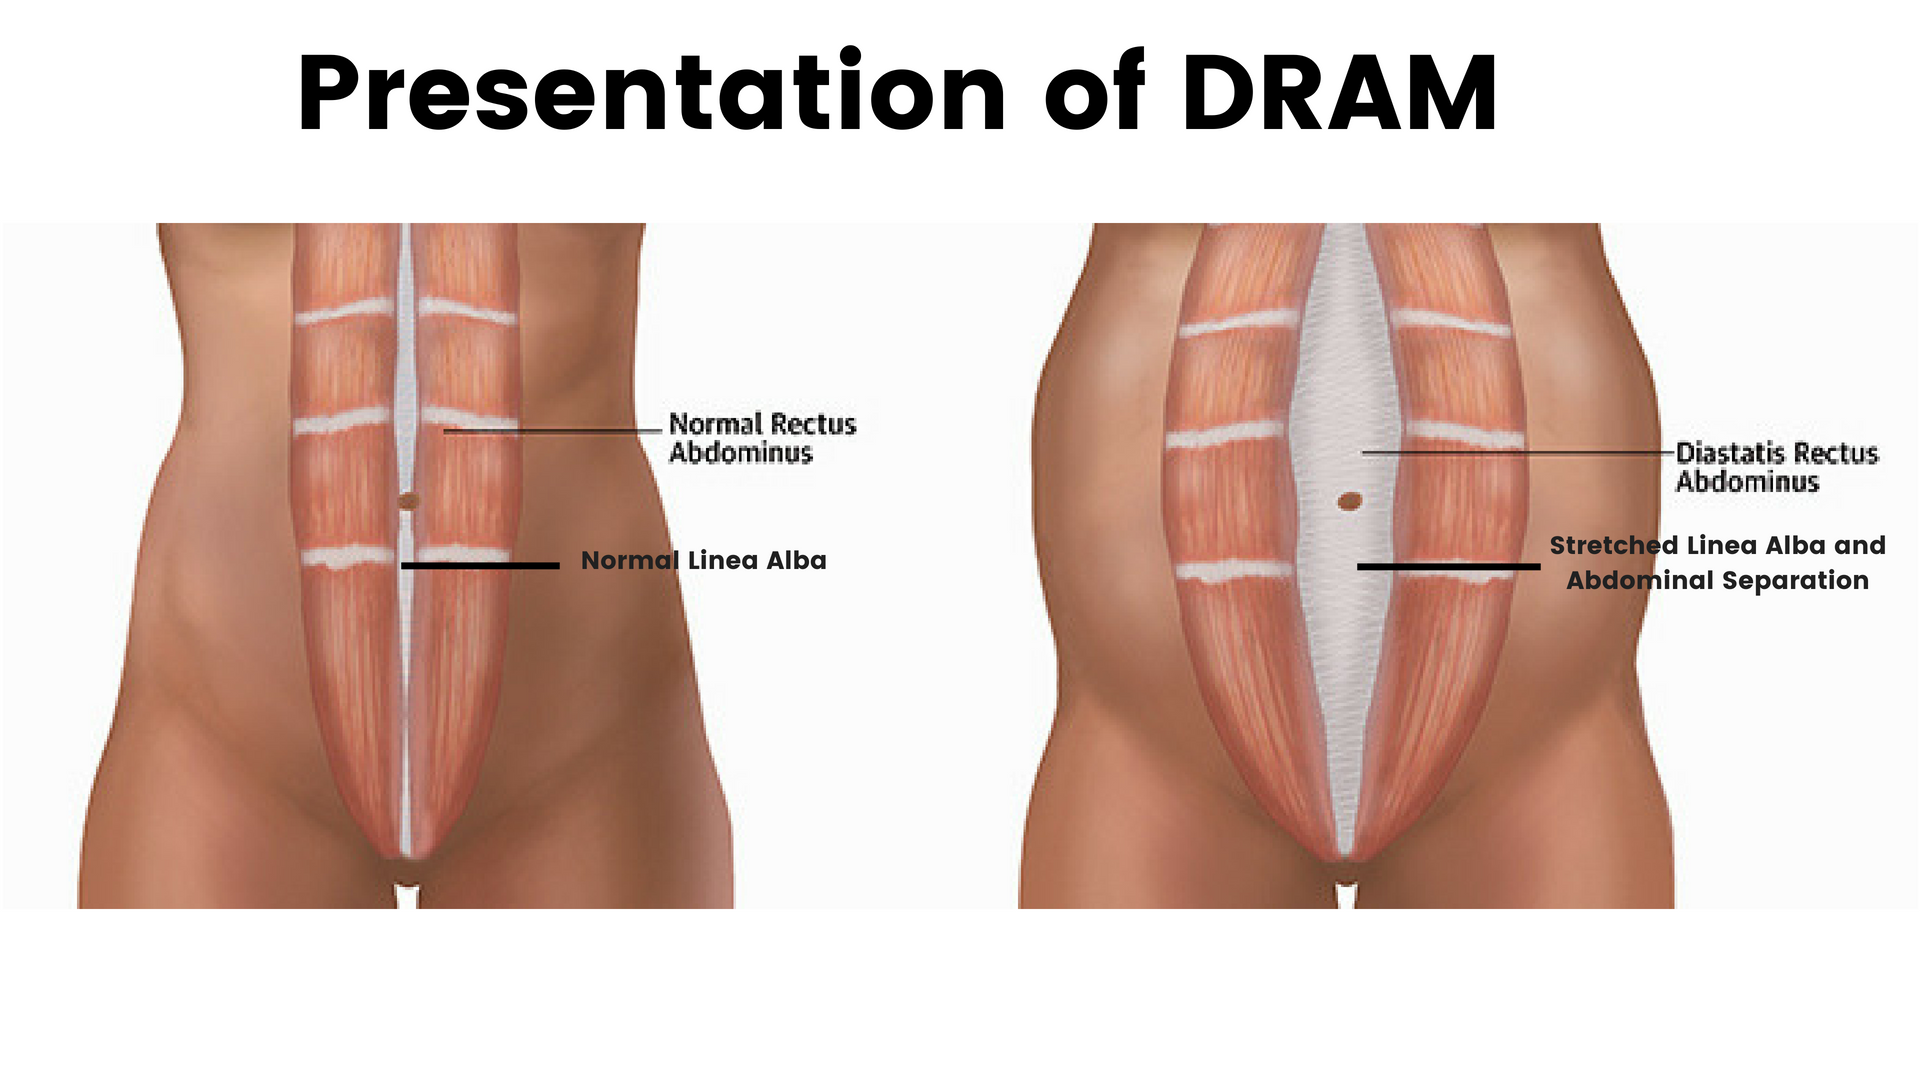 Diastasis Of The Rectus Abdominis Dram And Clinical Pilates